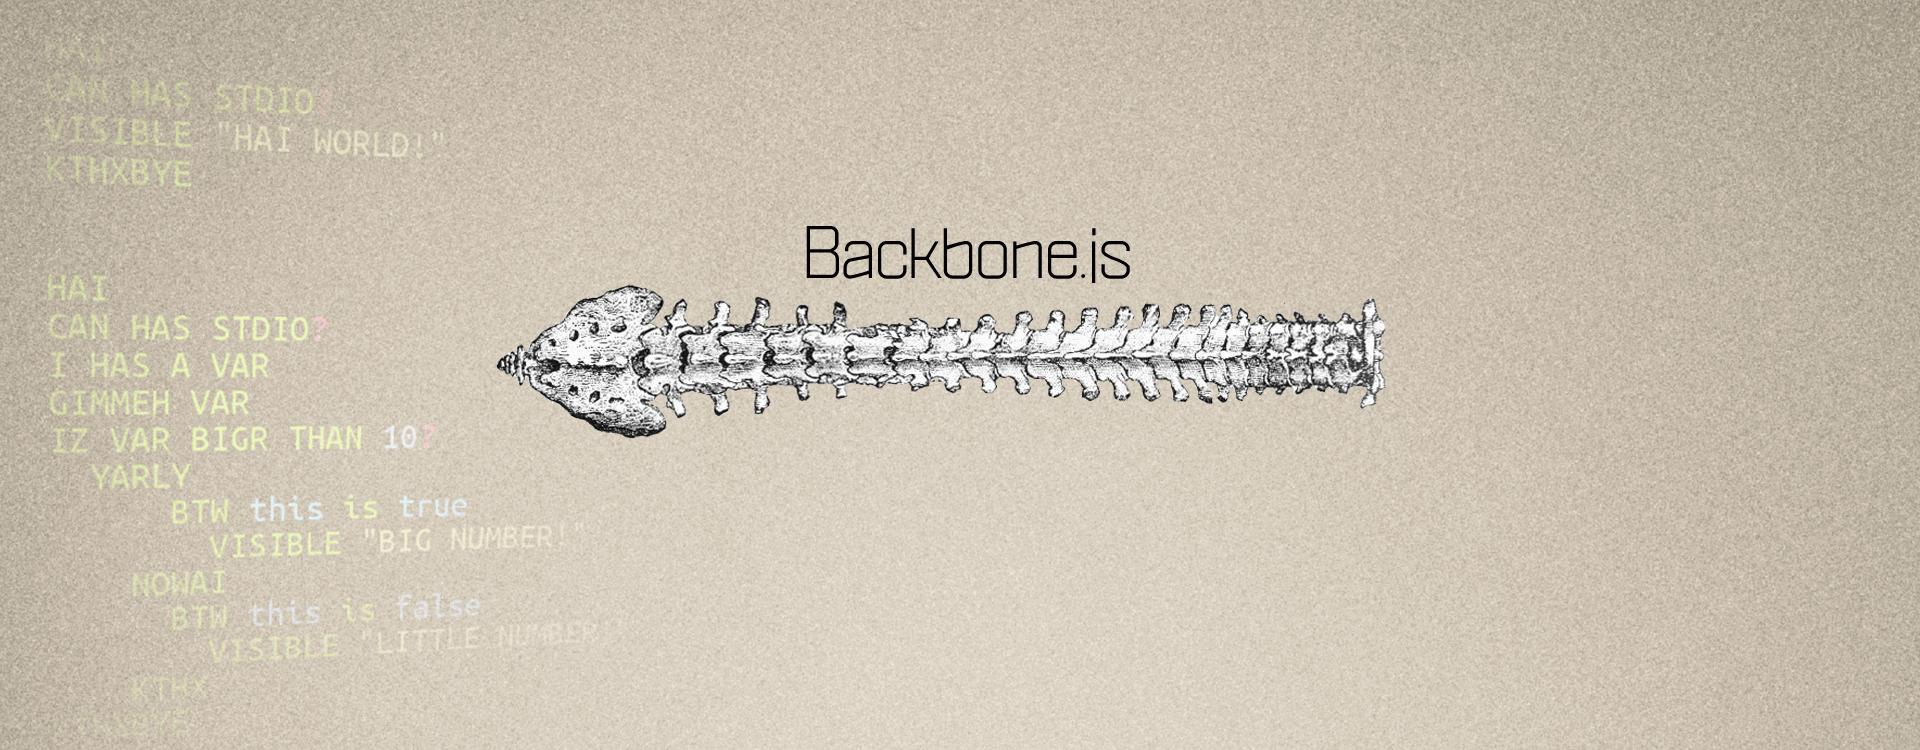 backbone_lol (1) (1) (1)